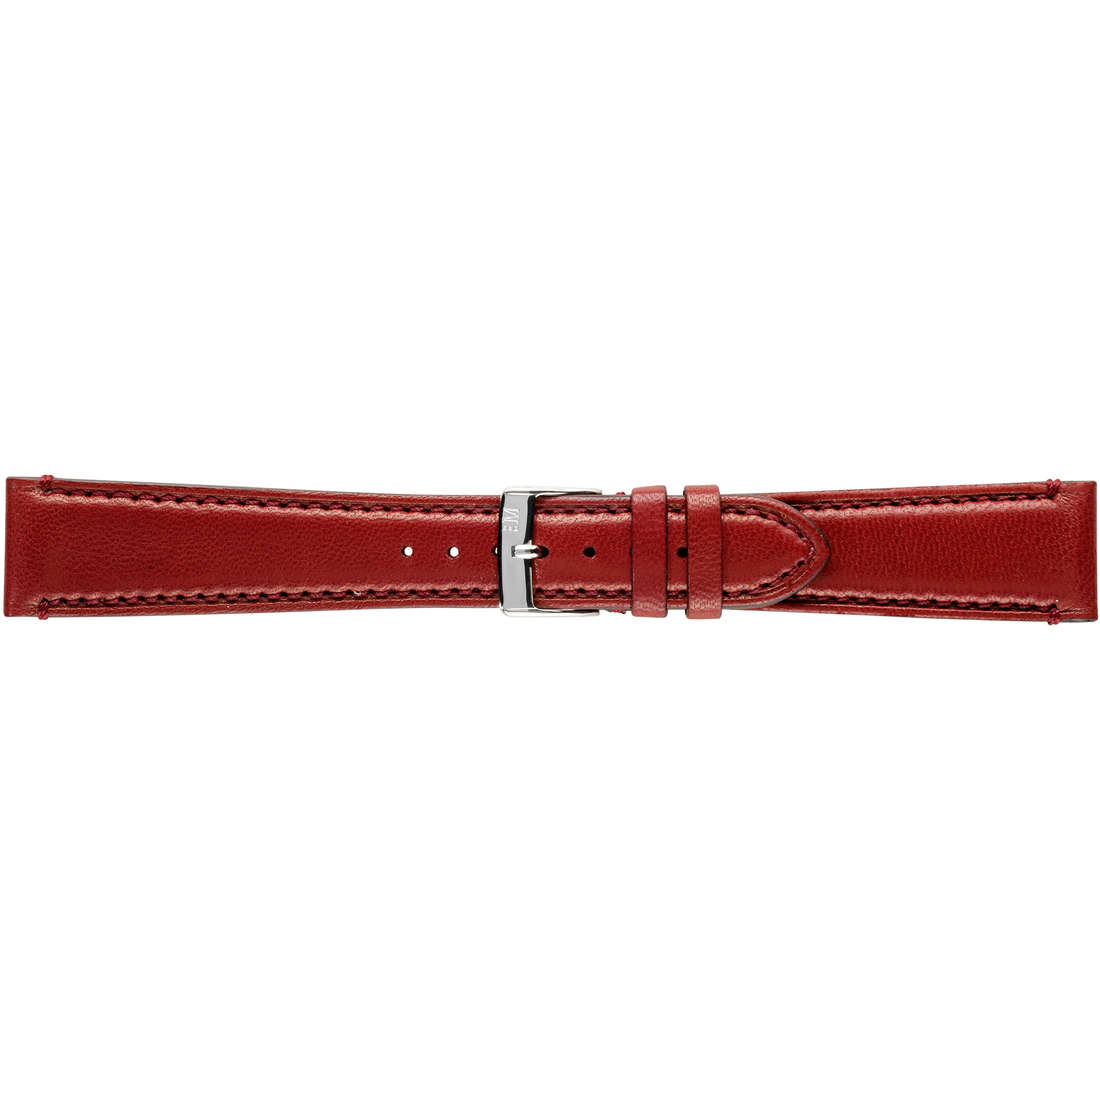 watch watch bands watch straps man Morellato Manufatti A01X3495006182CR20